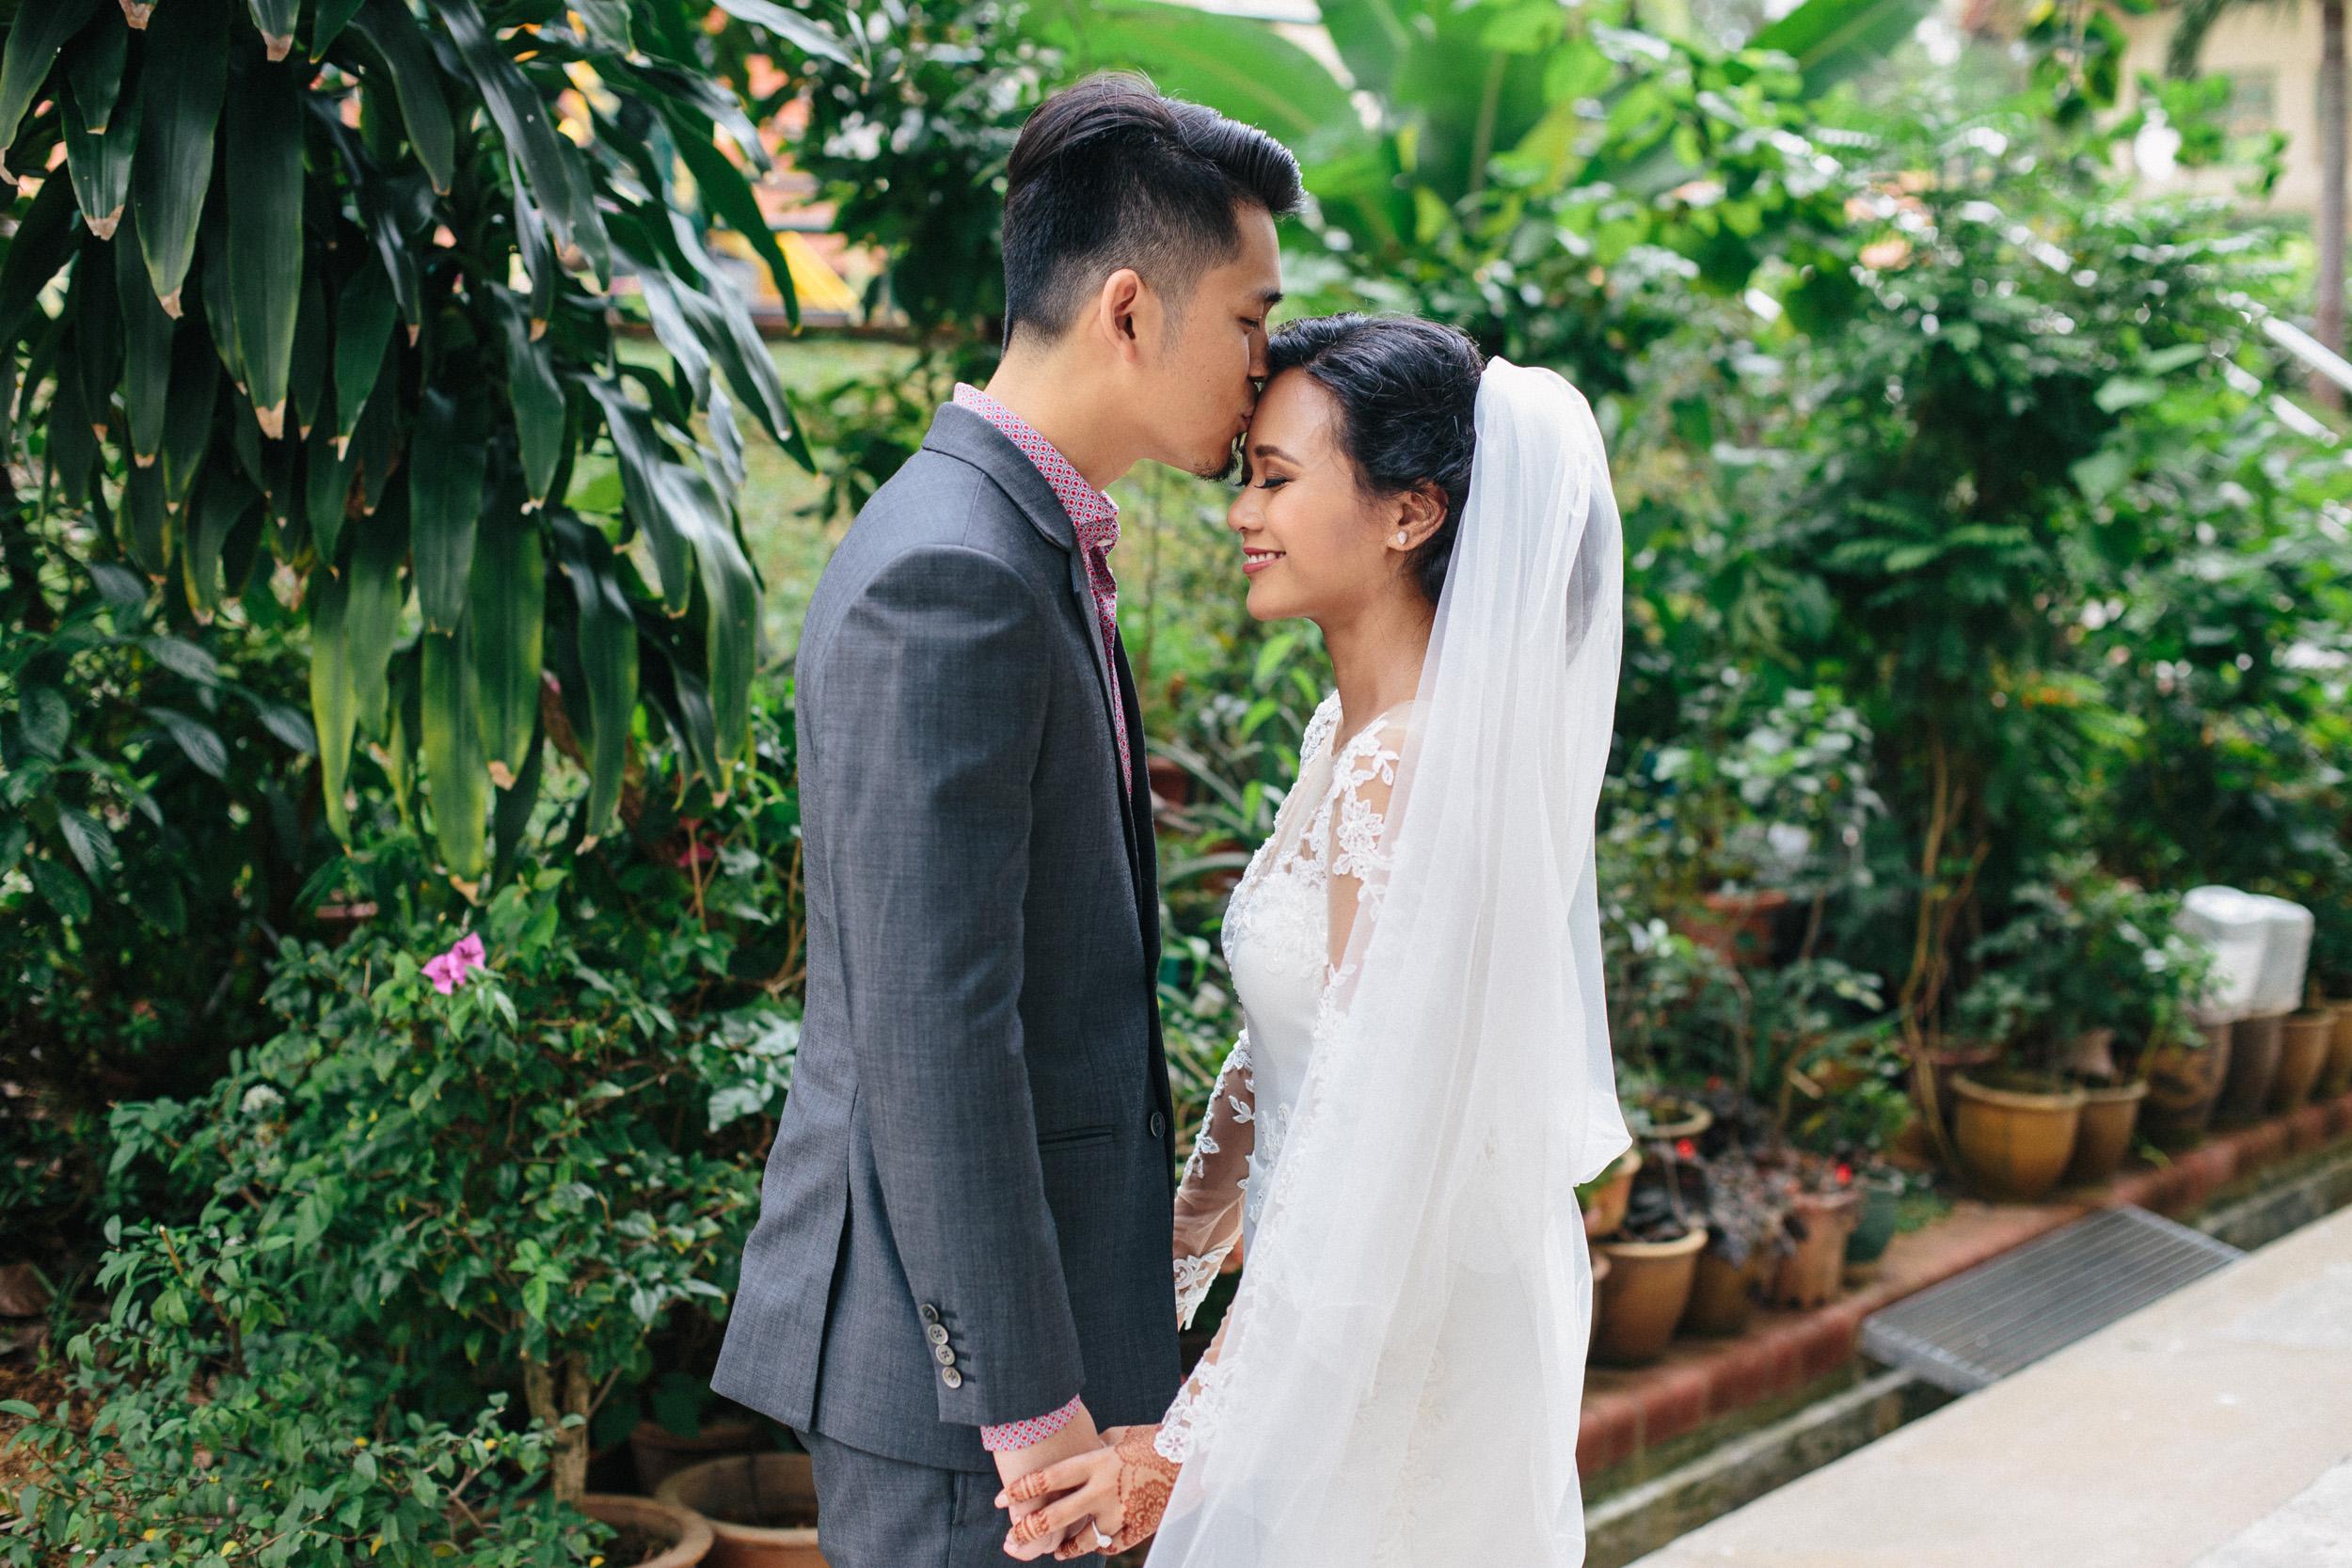 singapore-wedding-photographer-photography-wmt2017-035.jpg